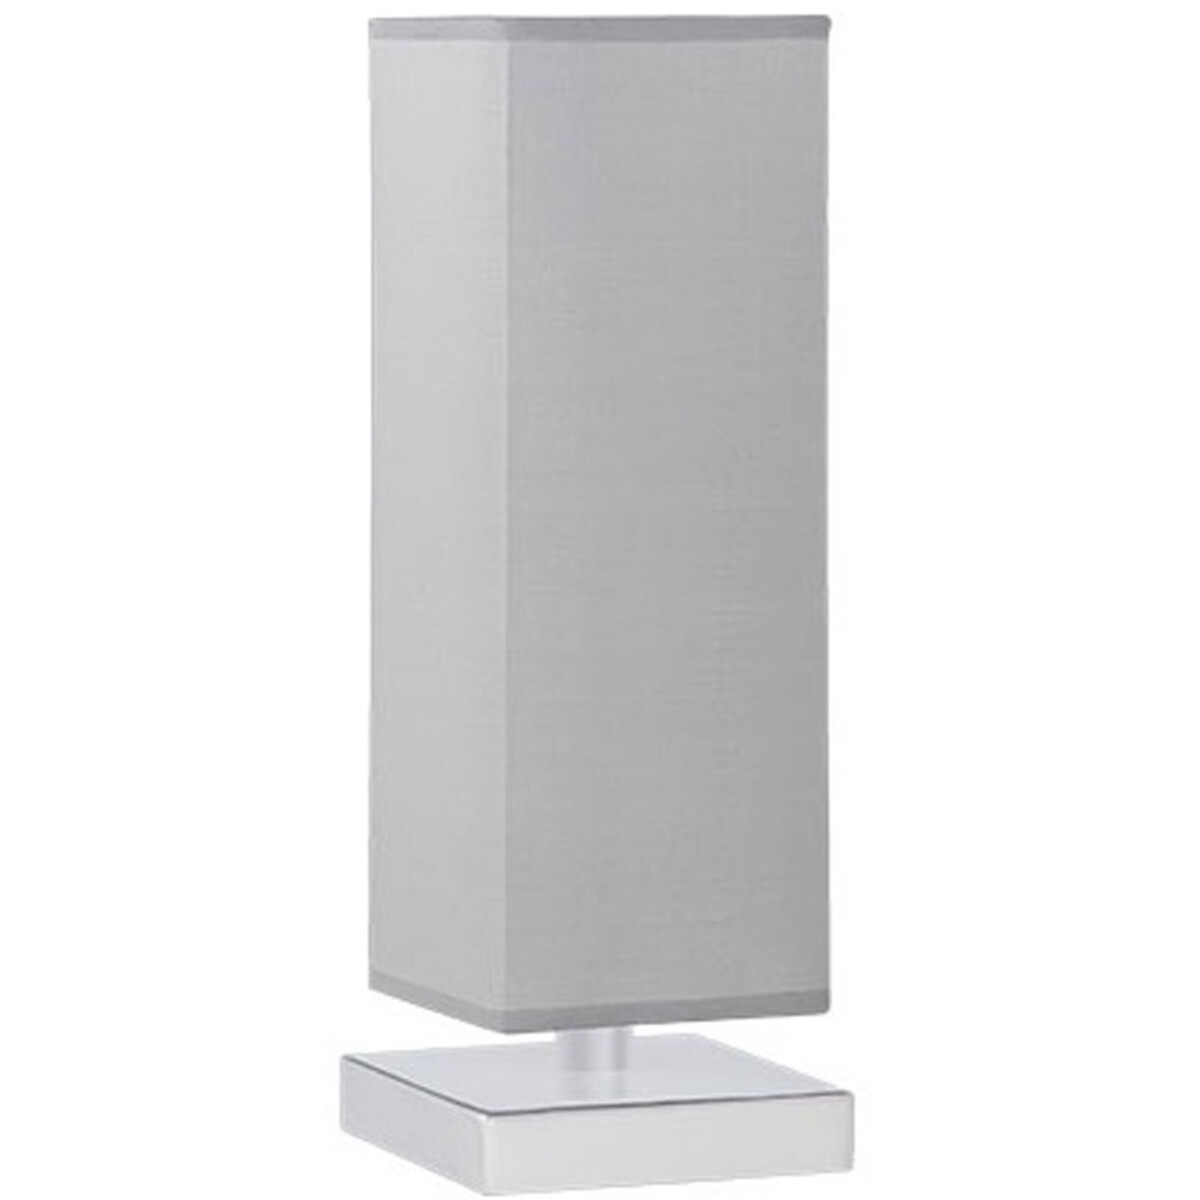 LED Tafellamp - Tafelverlichting - Trion Piti - E14 Fitting - Dimbaar - Rond - Mat Nikkel - Aluminiu